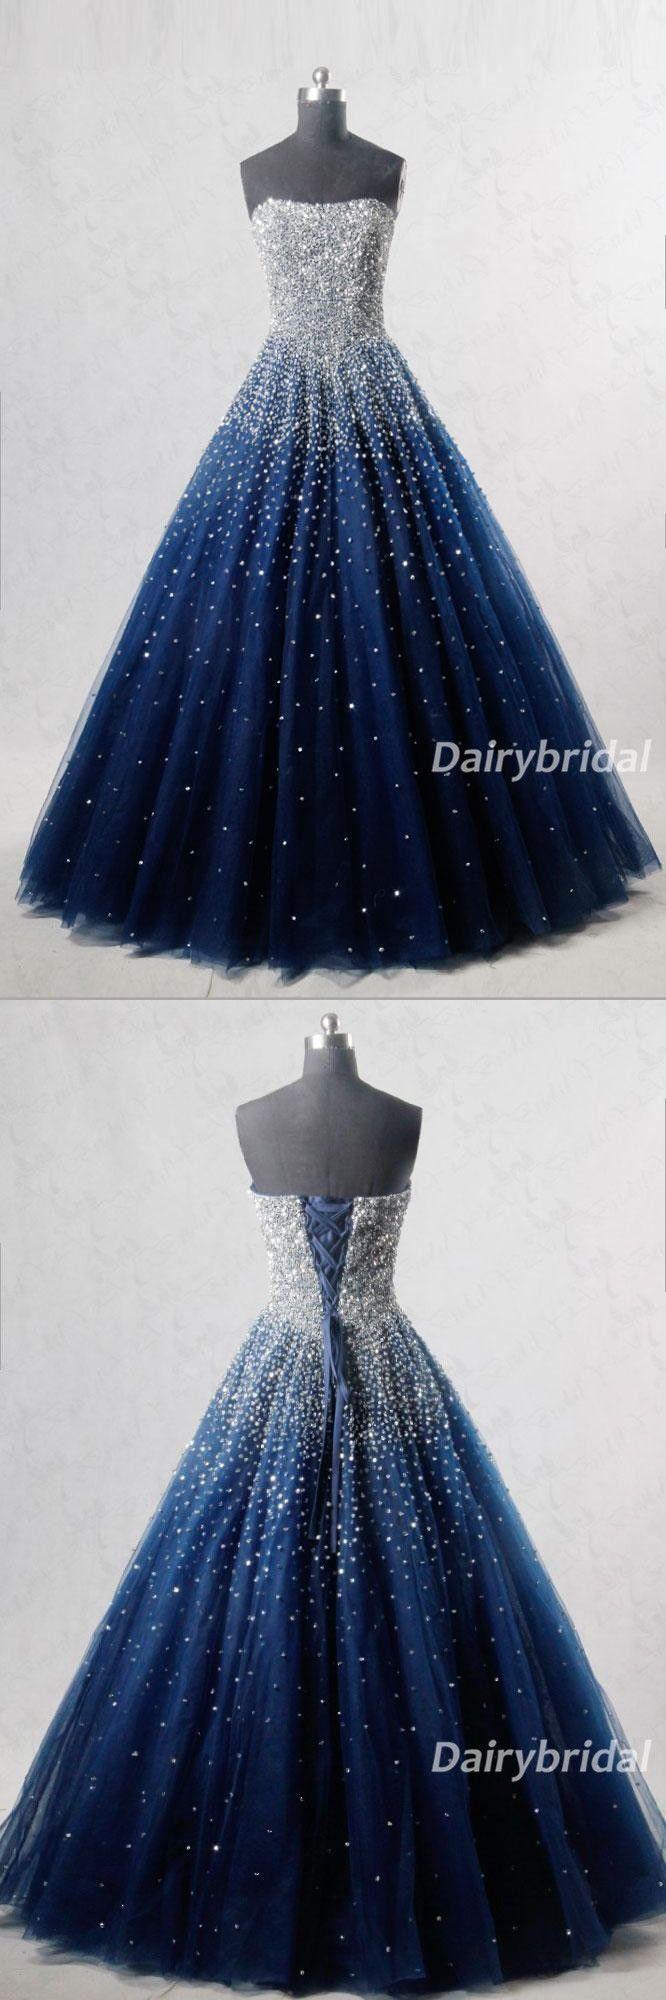 Sparkle Prom Dress, Sweet Heart Prom Dress, Sequin Prom Dress,Tulle Prom Dress, Beading Prom Dress, DA924  #dairybridal